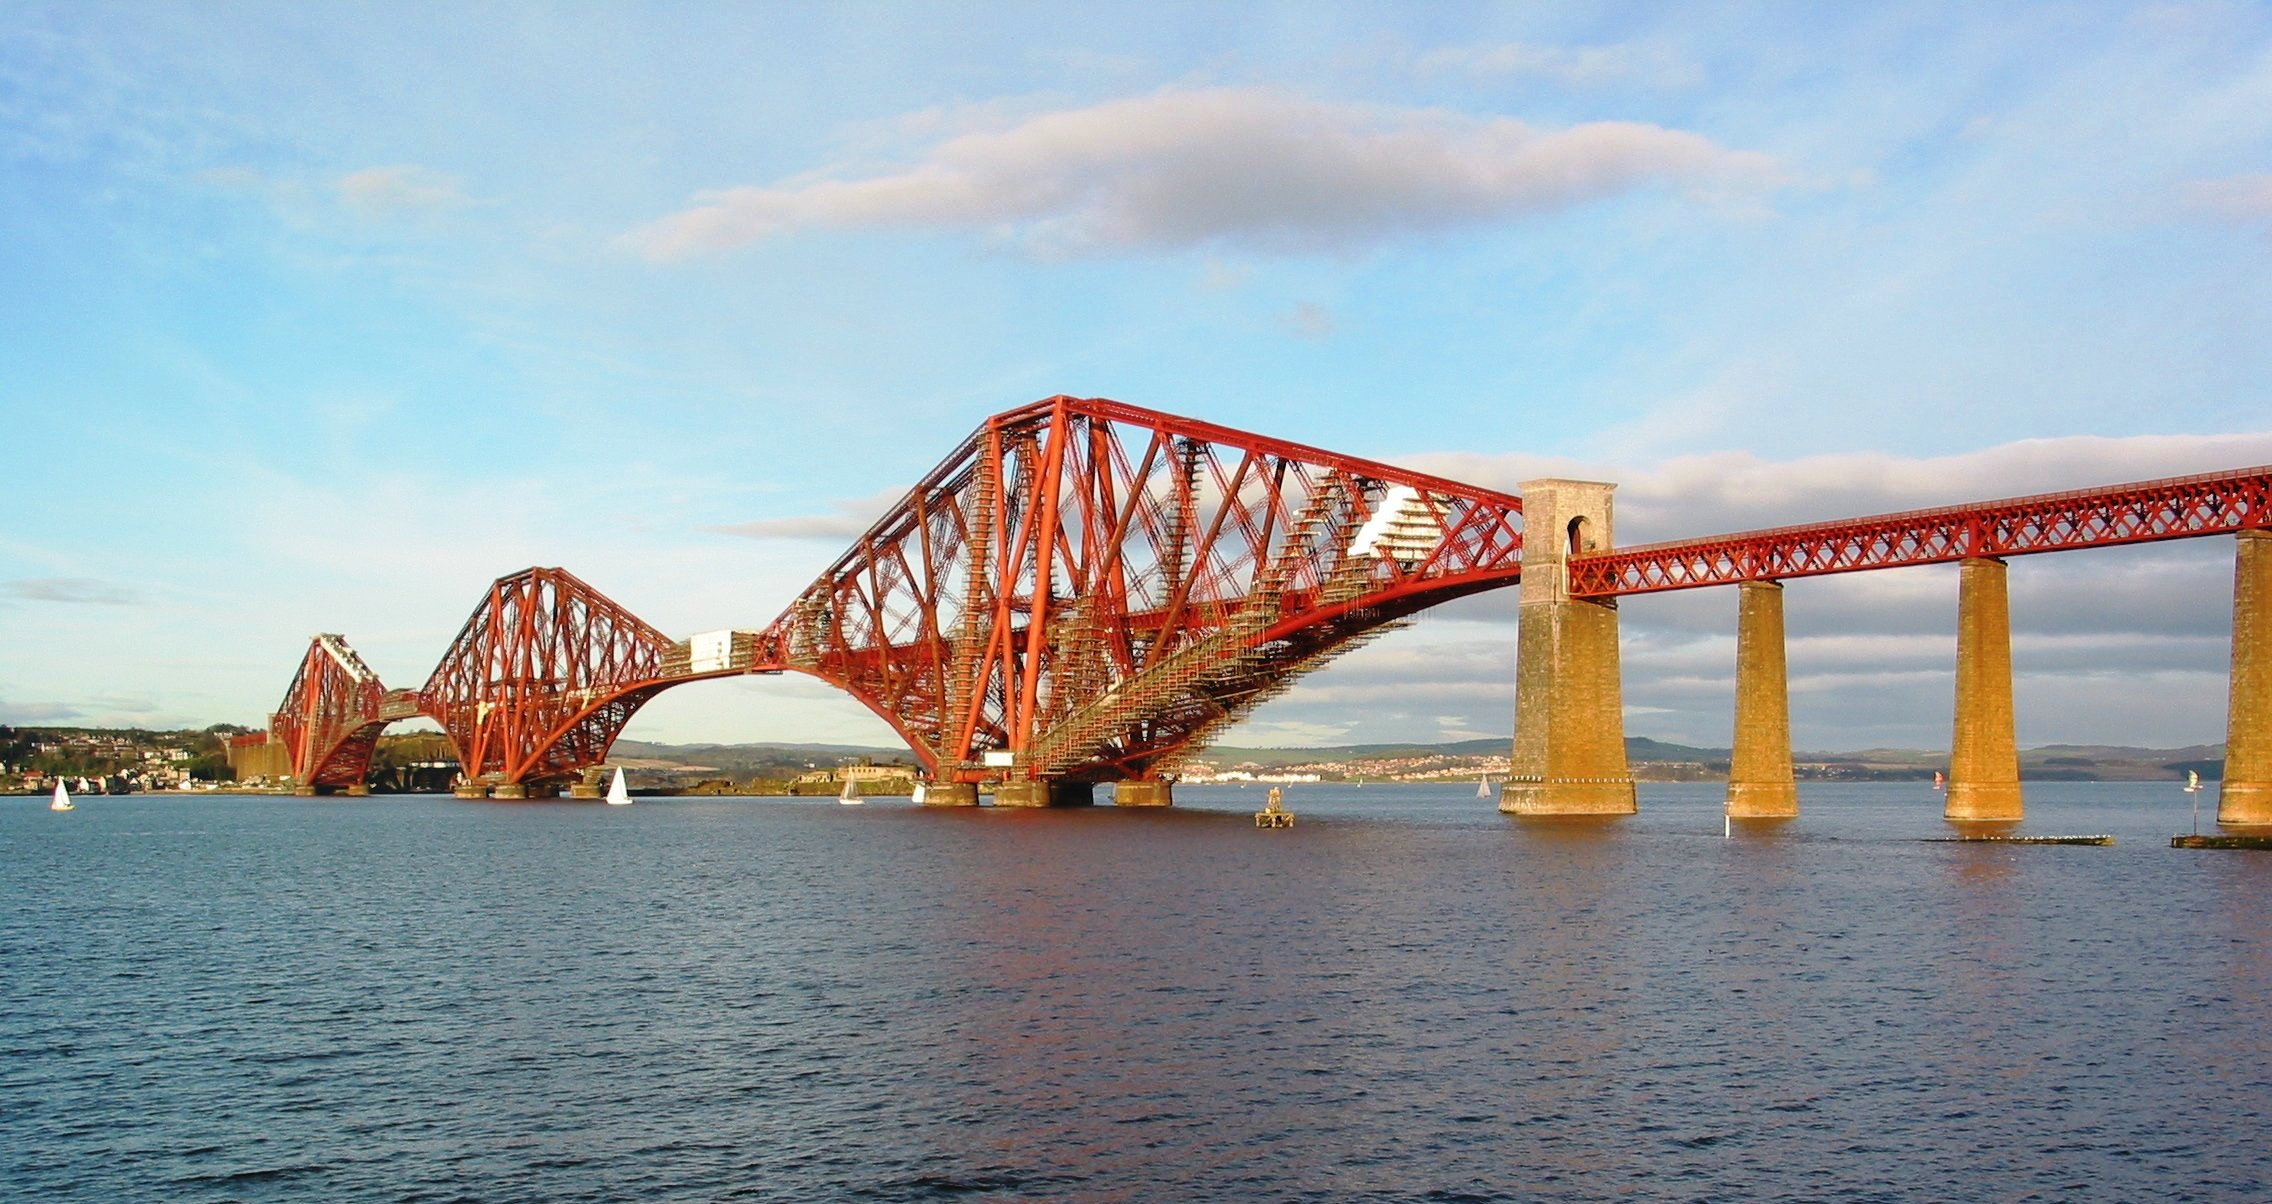 Depiction of Forth Bridge